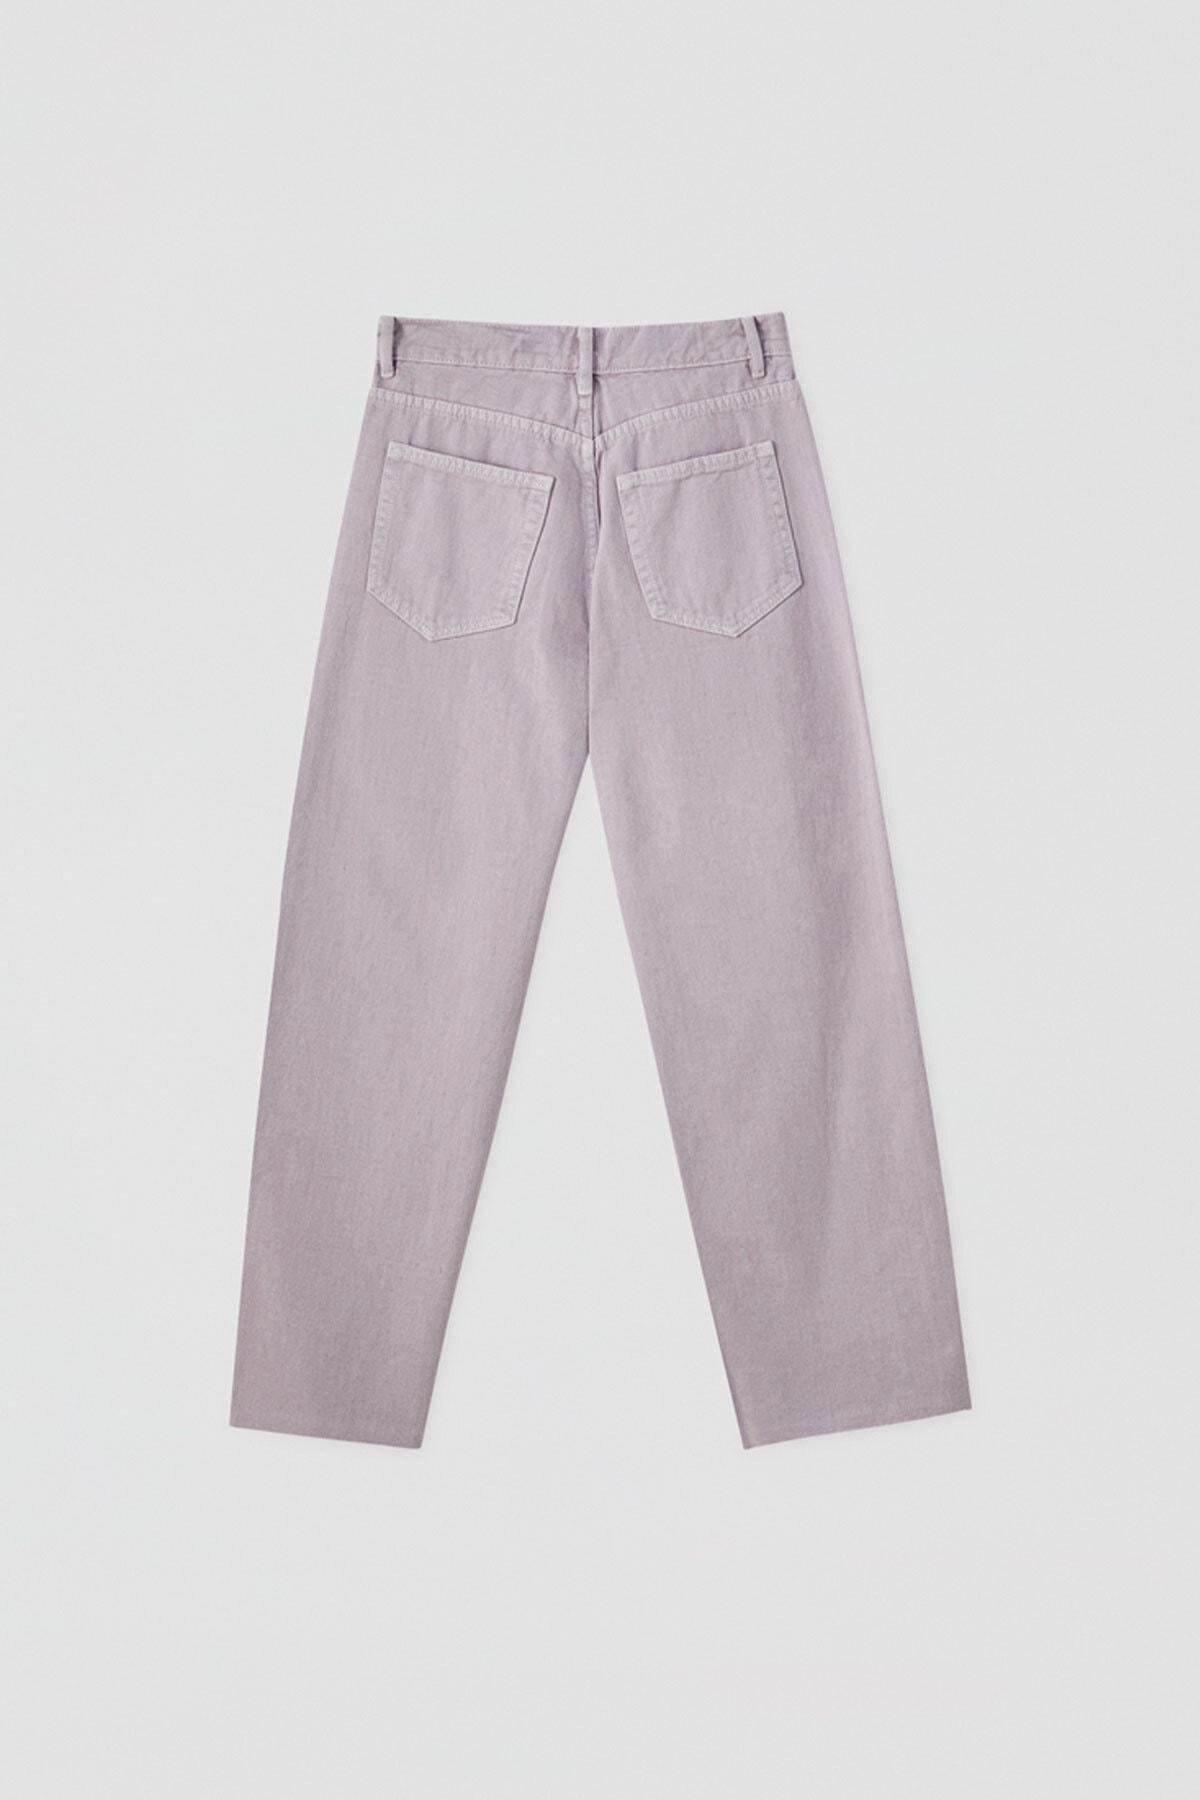 Pull & Bear Kadın Leylak Crop Straight Fit Jean 05670330 4